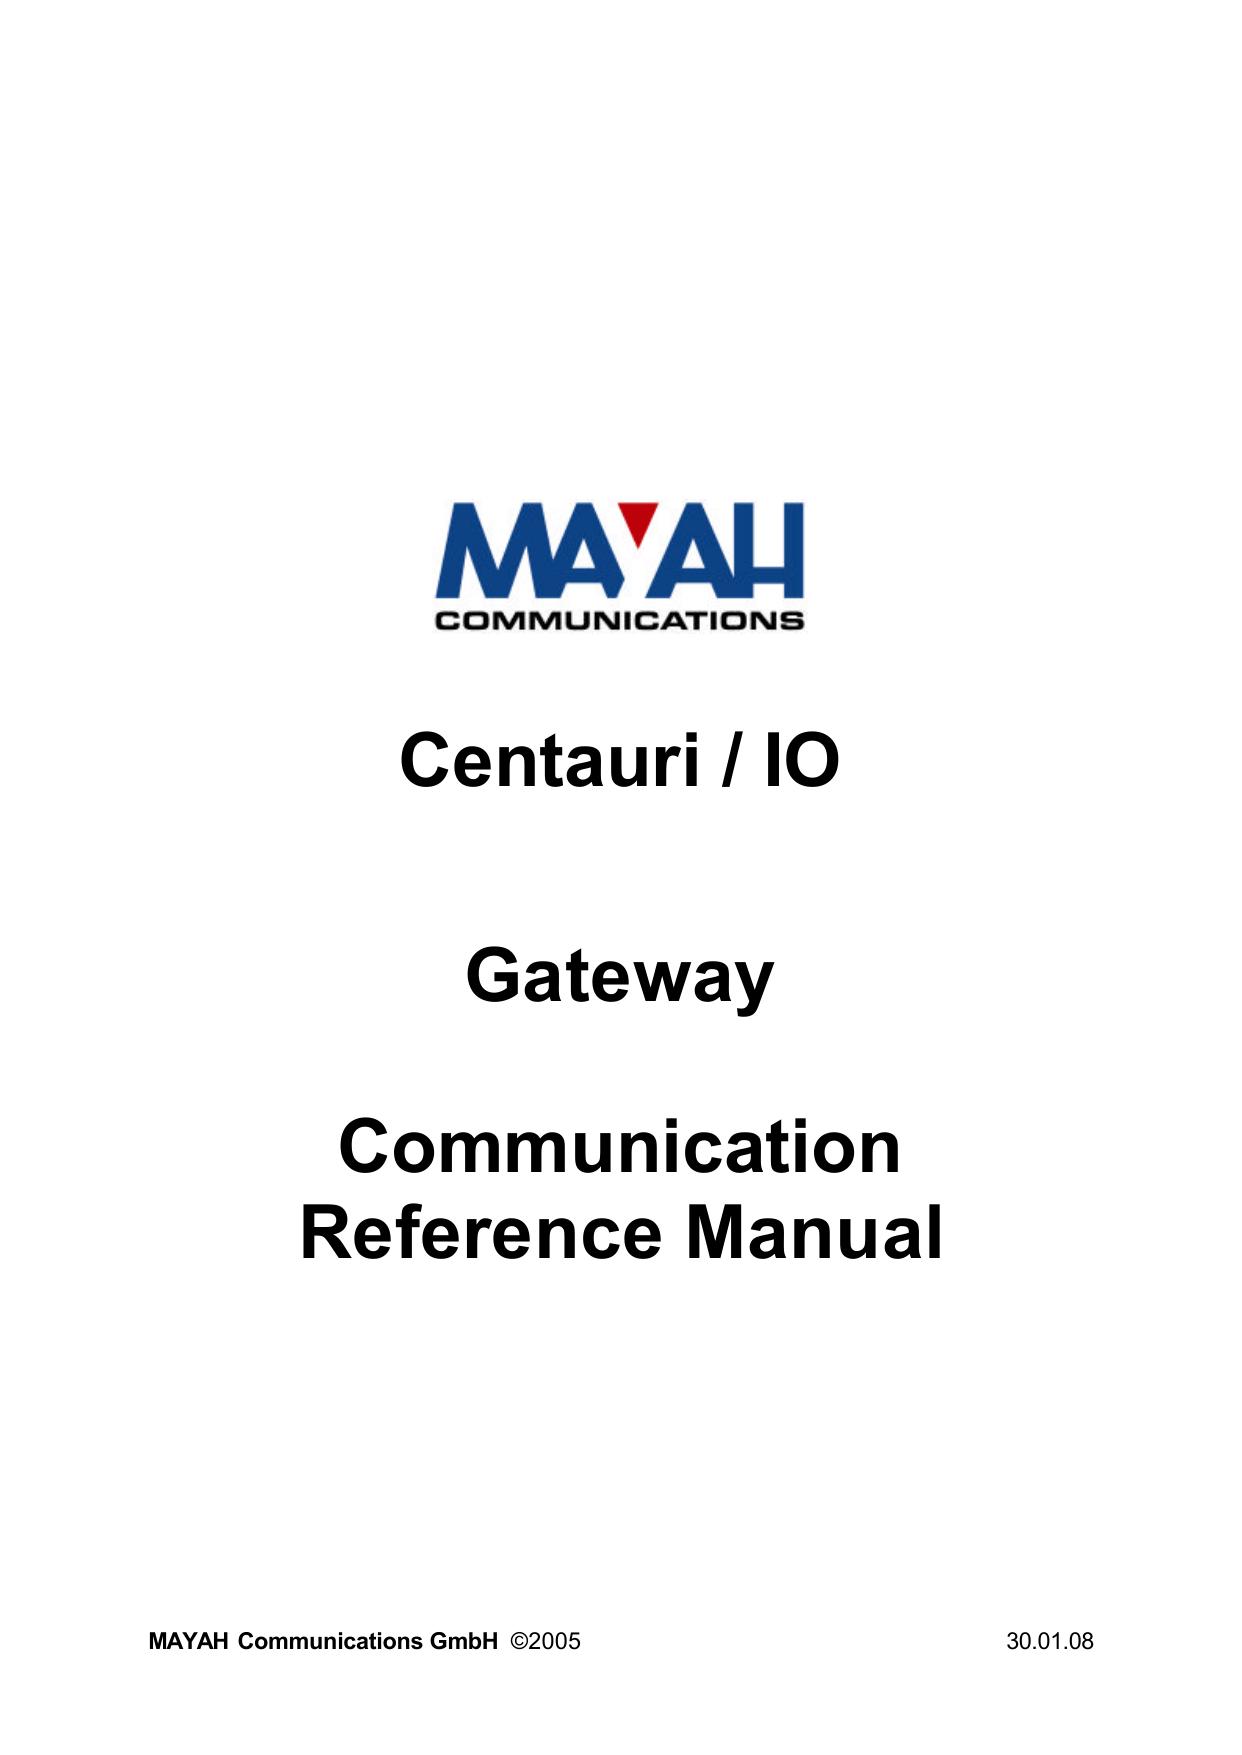 Centauri / IO Gateway Communication Reference Manual